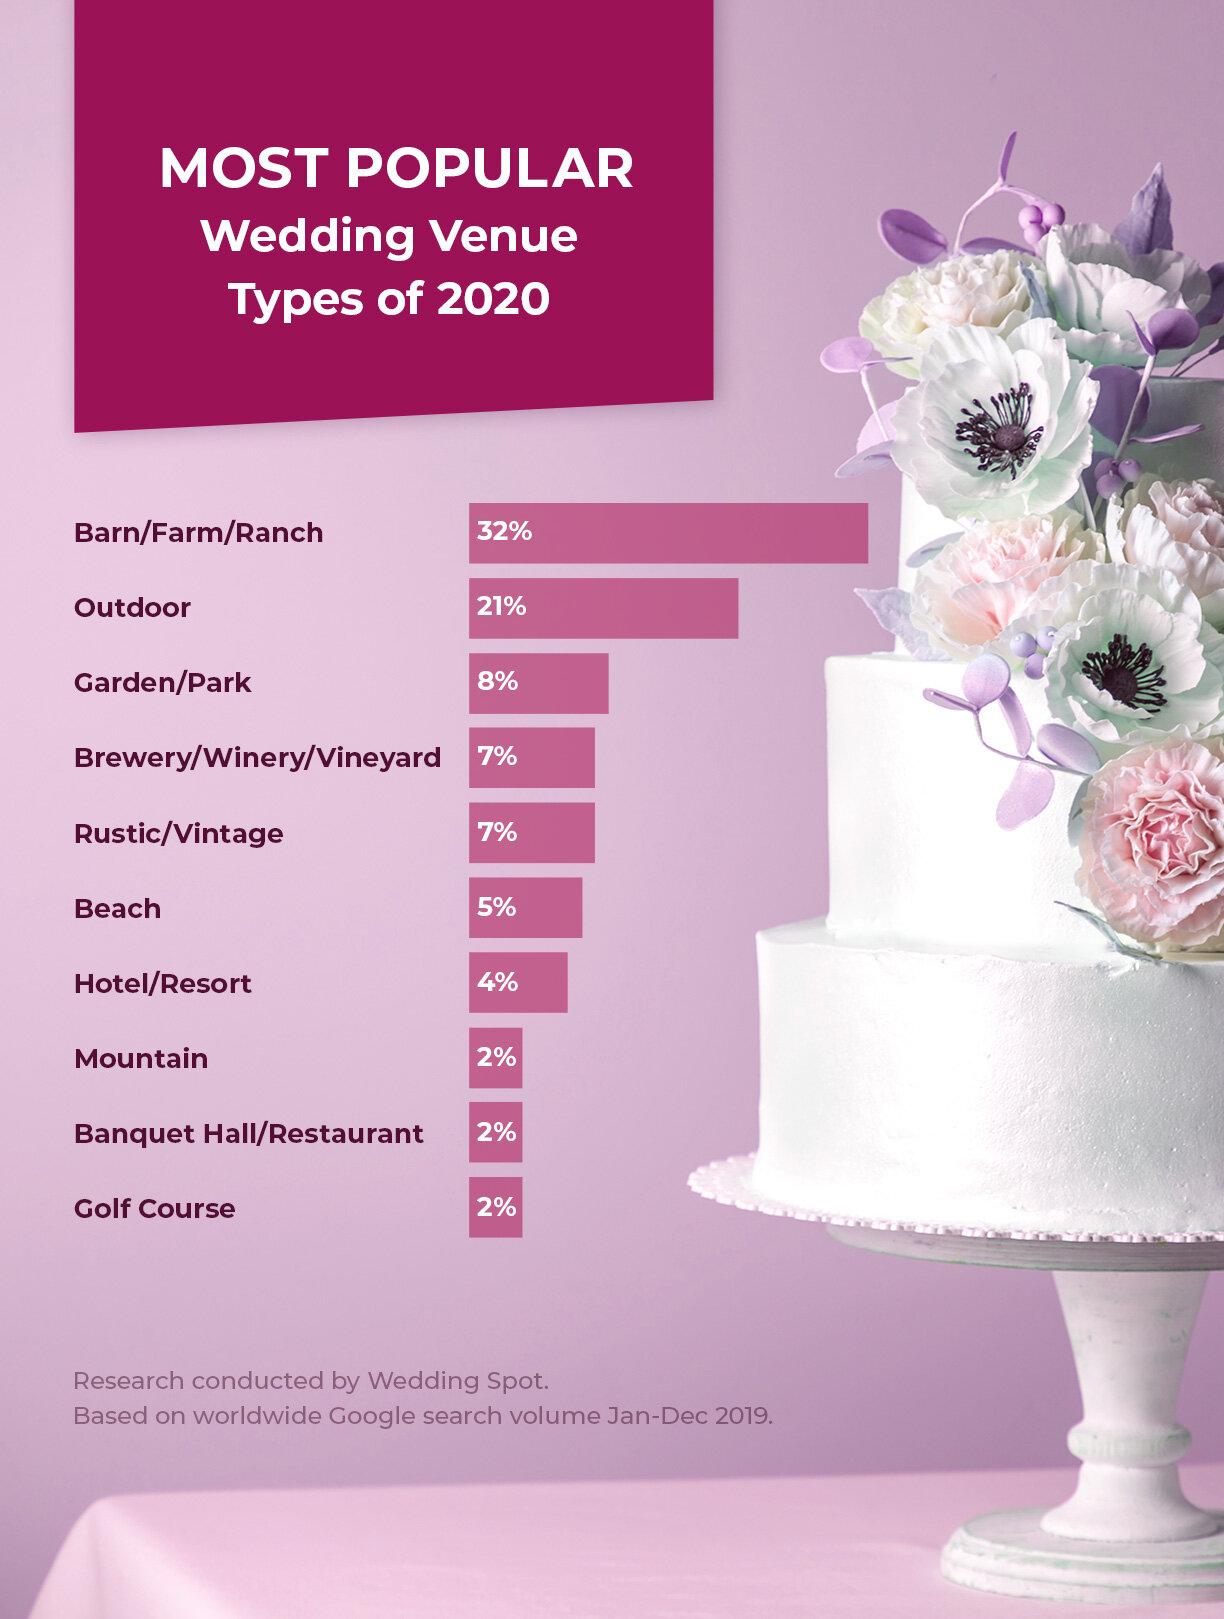 Most Popular Wedding Venue Types of 2020.jpg